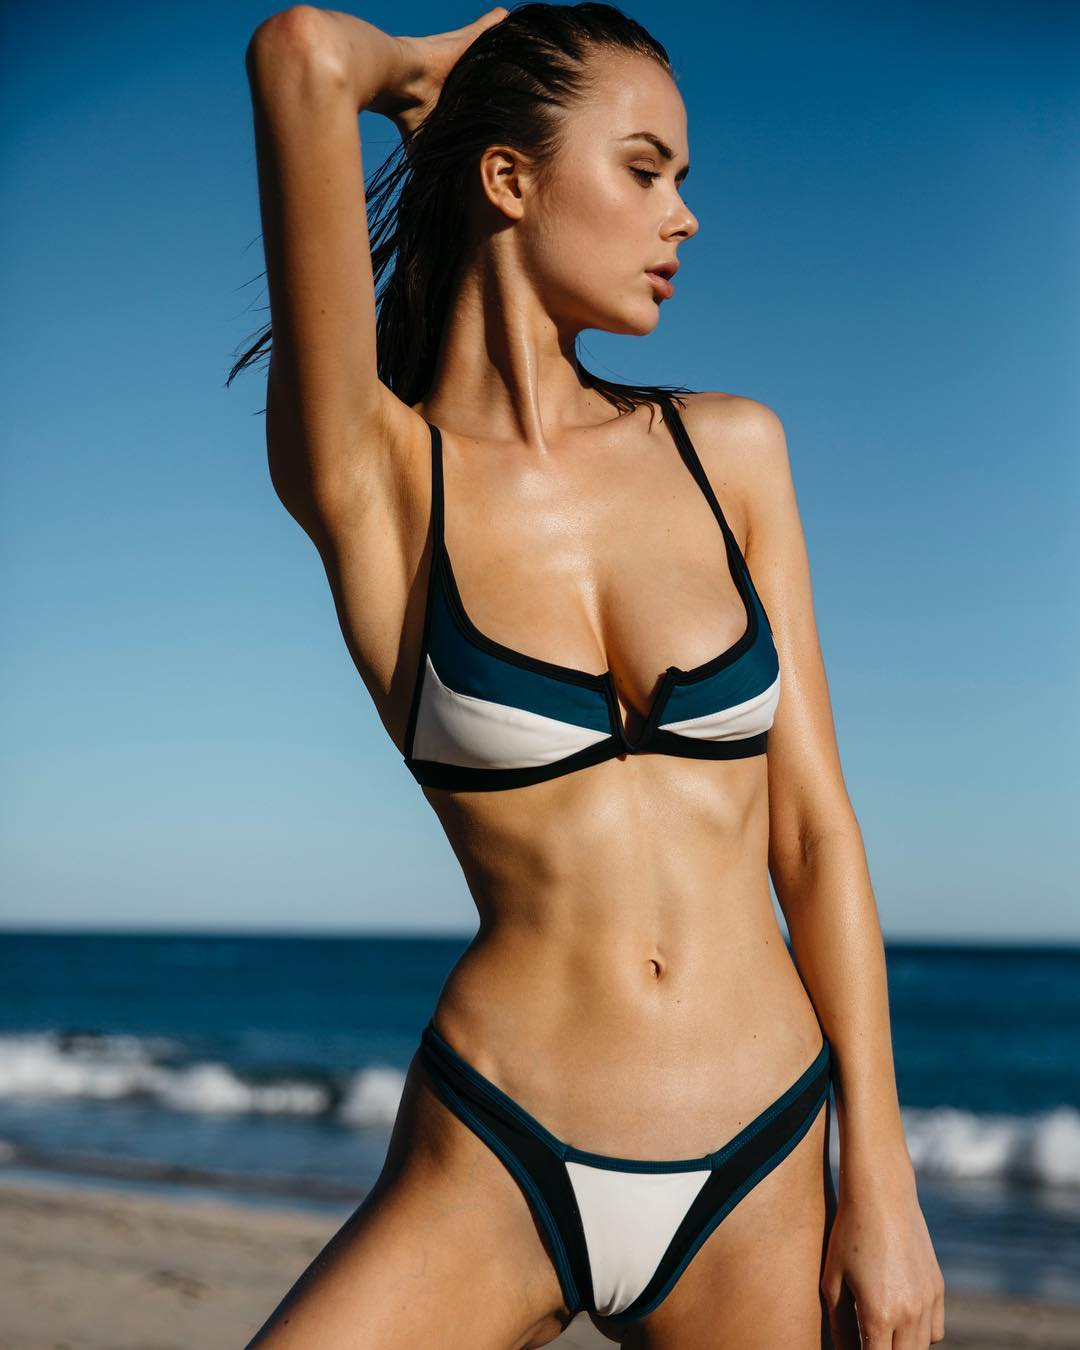 Bikini Jana Jung nudes (93 foto and video), Sexy, Cleavage, Instagram, bra 2006